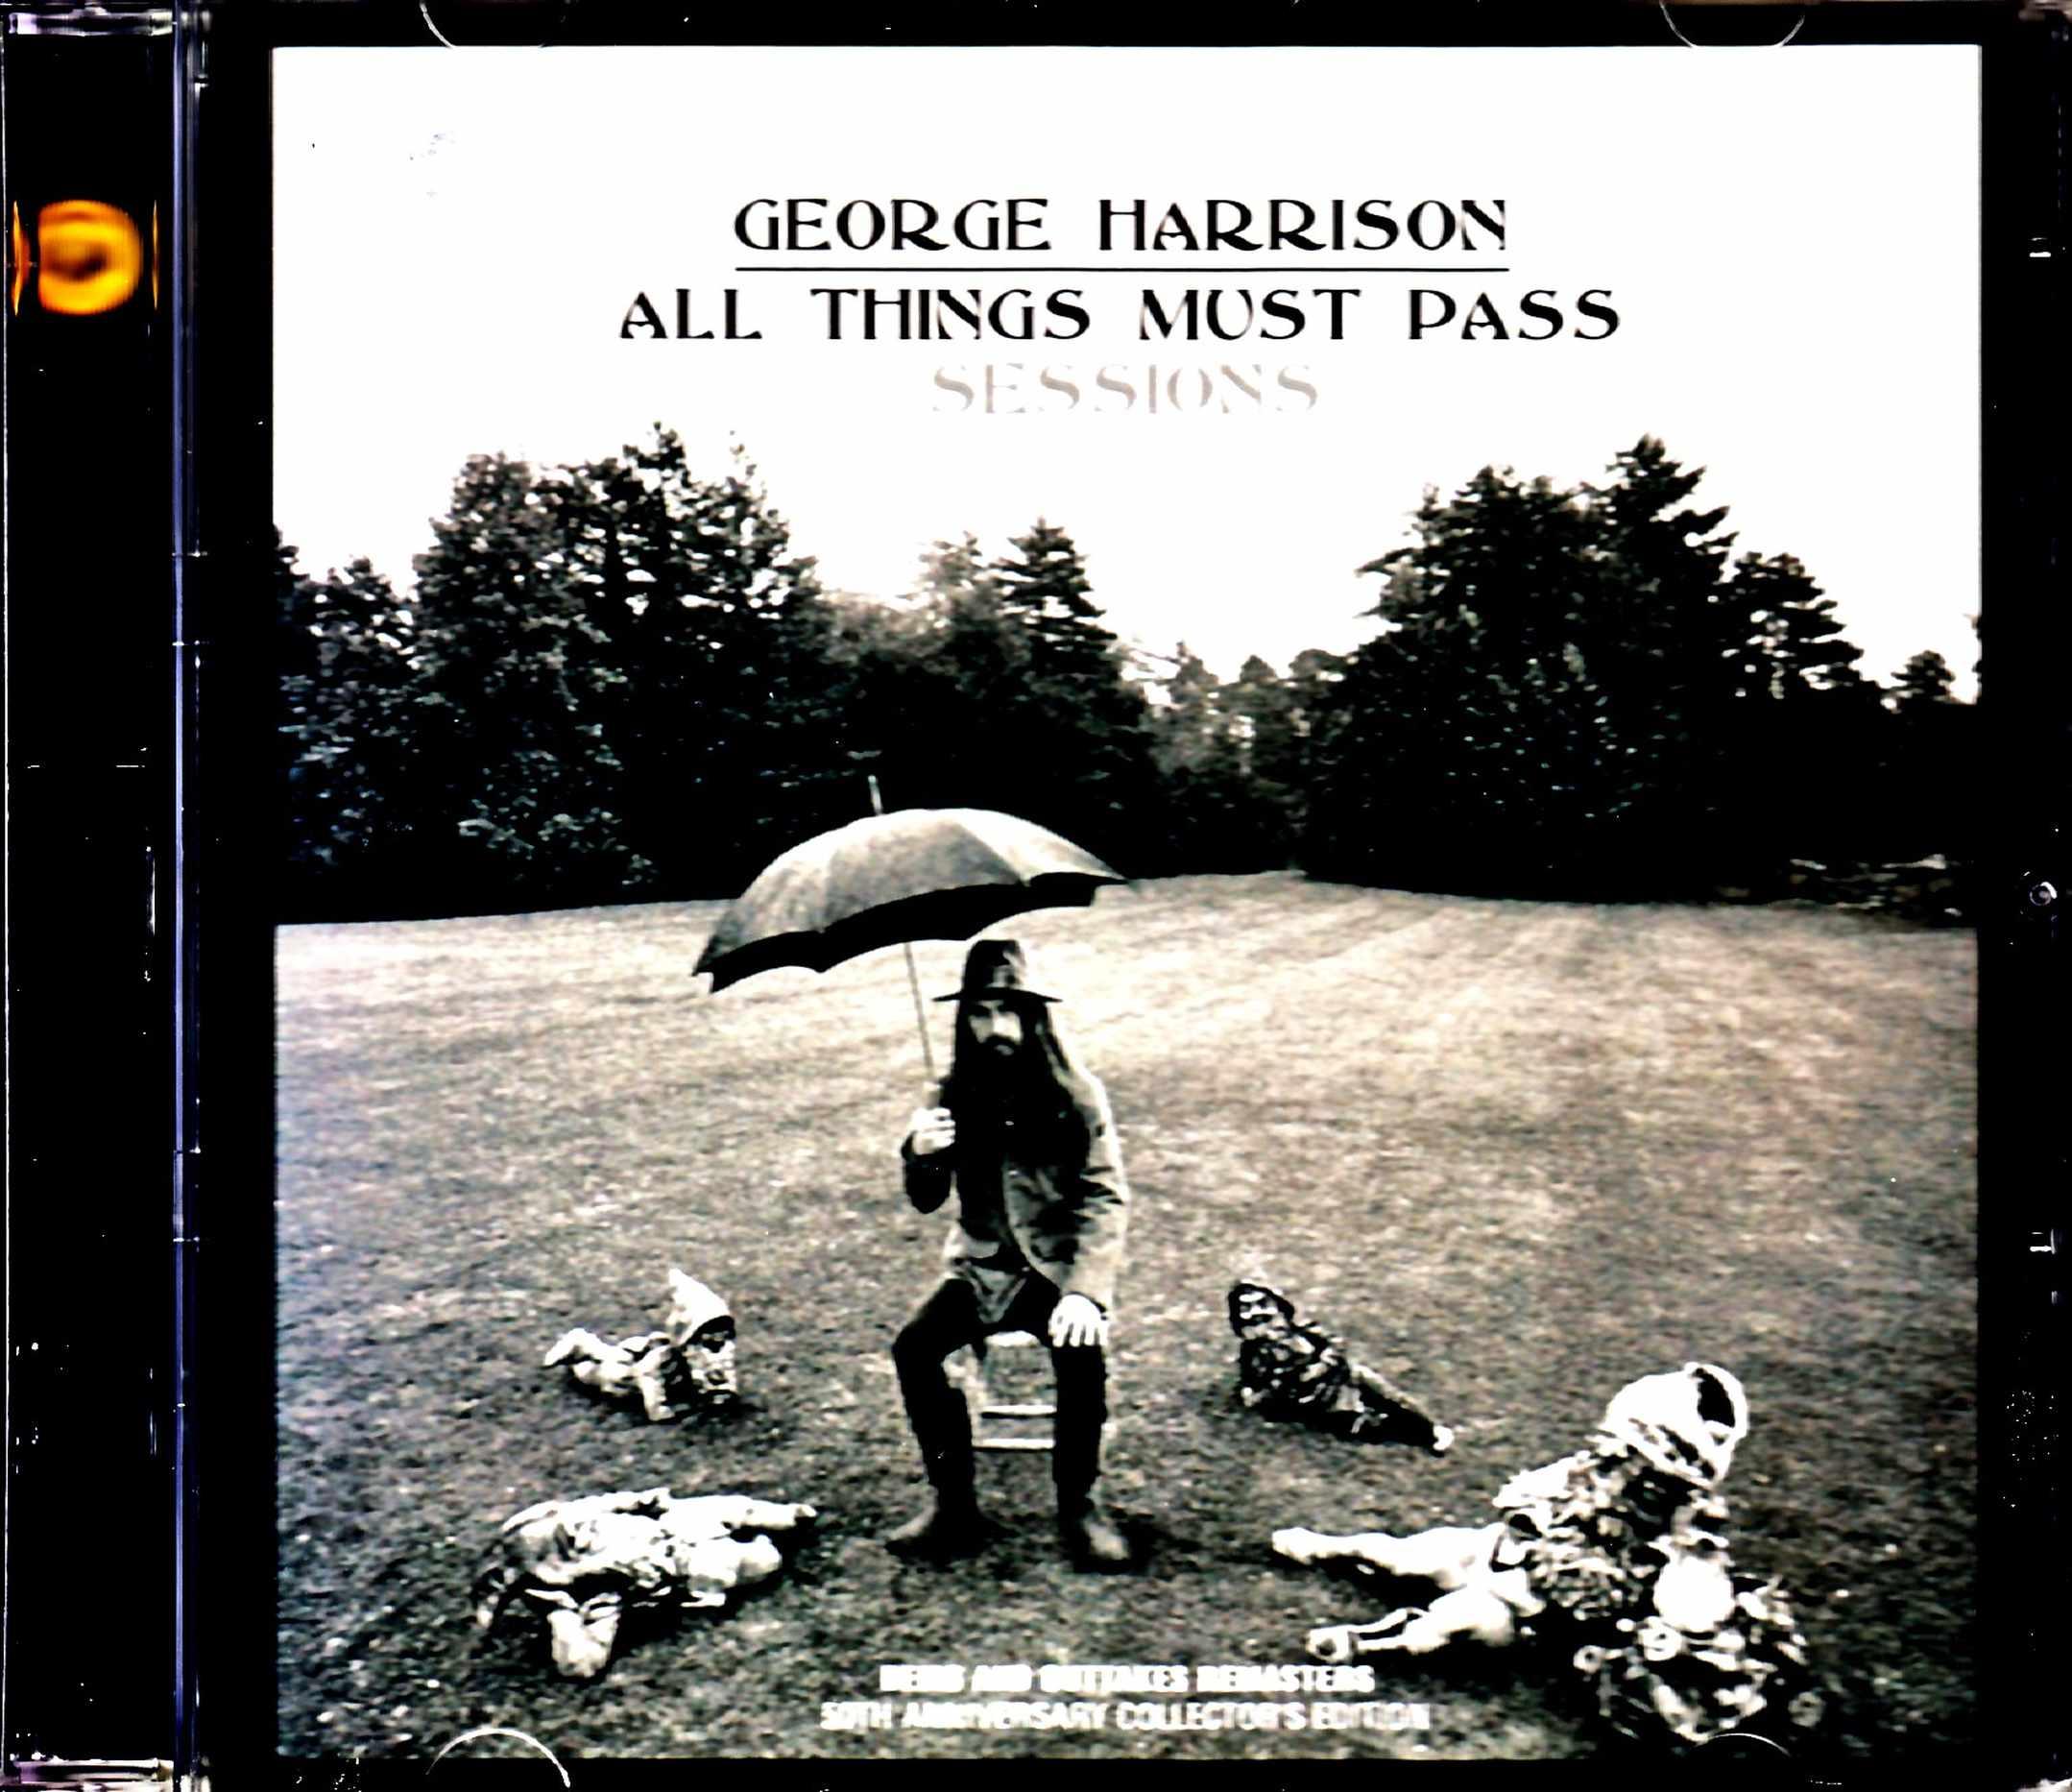 George Harrison ジョージ・ハリソン/オール・シングス・マスト・パス All Things Must Pass Sessions